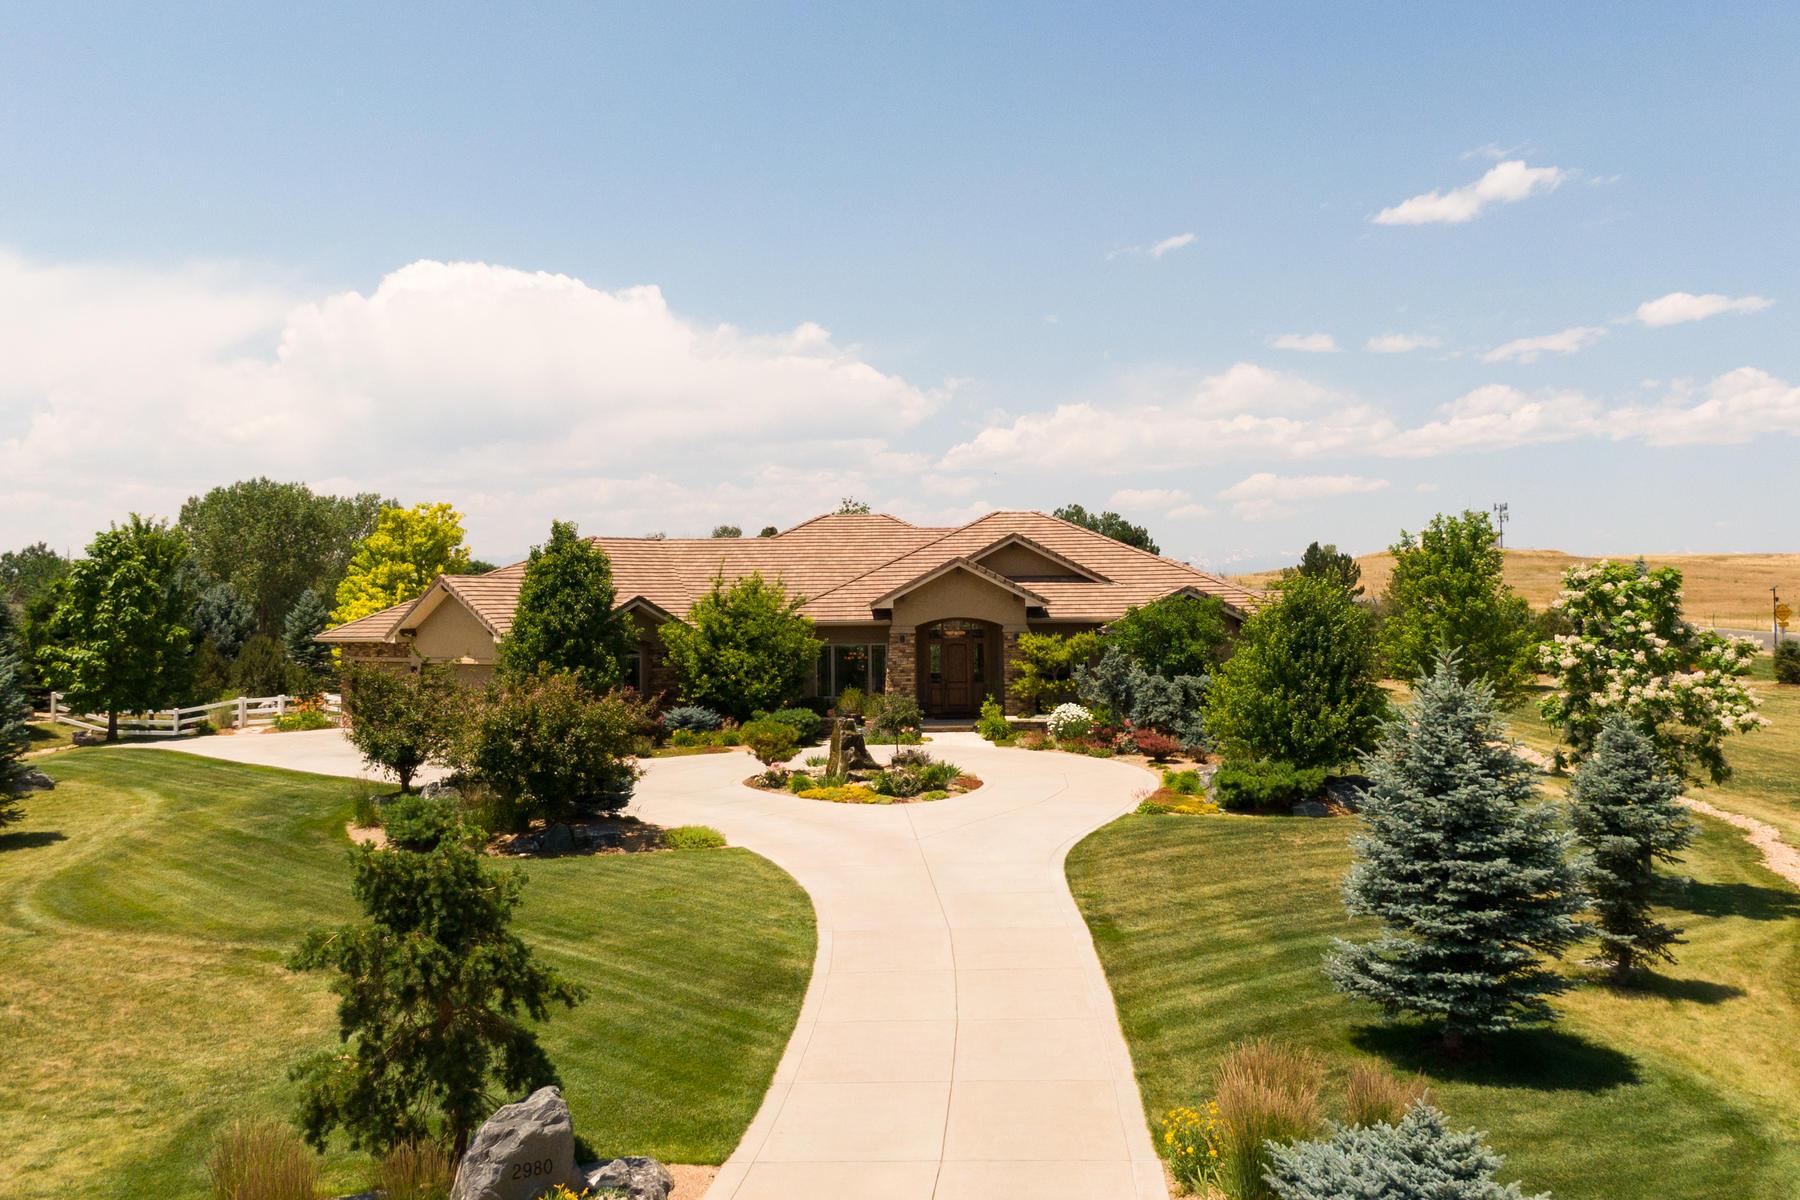 Single Family Homes для того Продажа на This Home Has It All 2980 High Prairie Way, Broomfield, Колорадо 80023 Соединенные Штаты